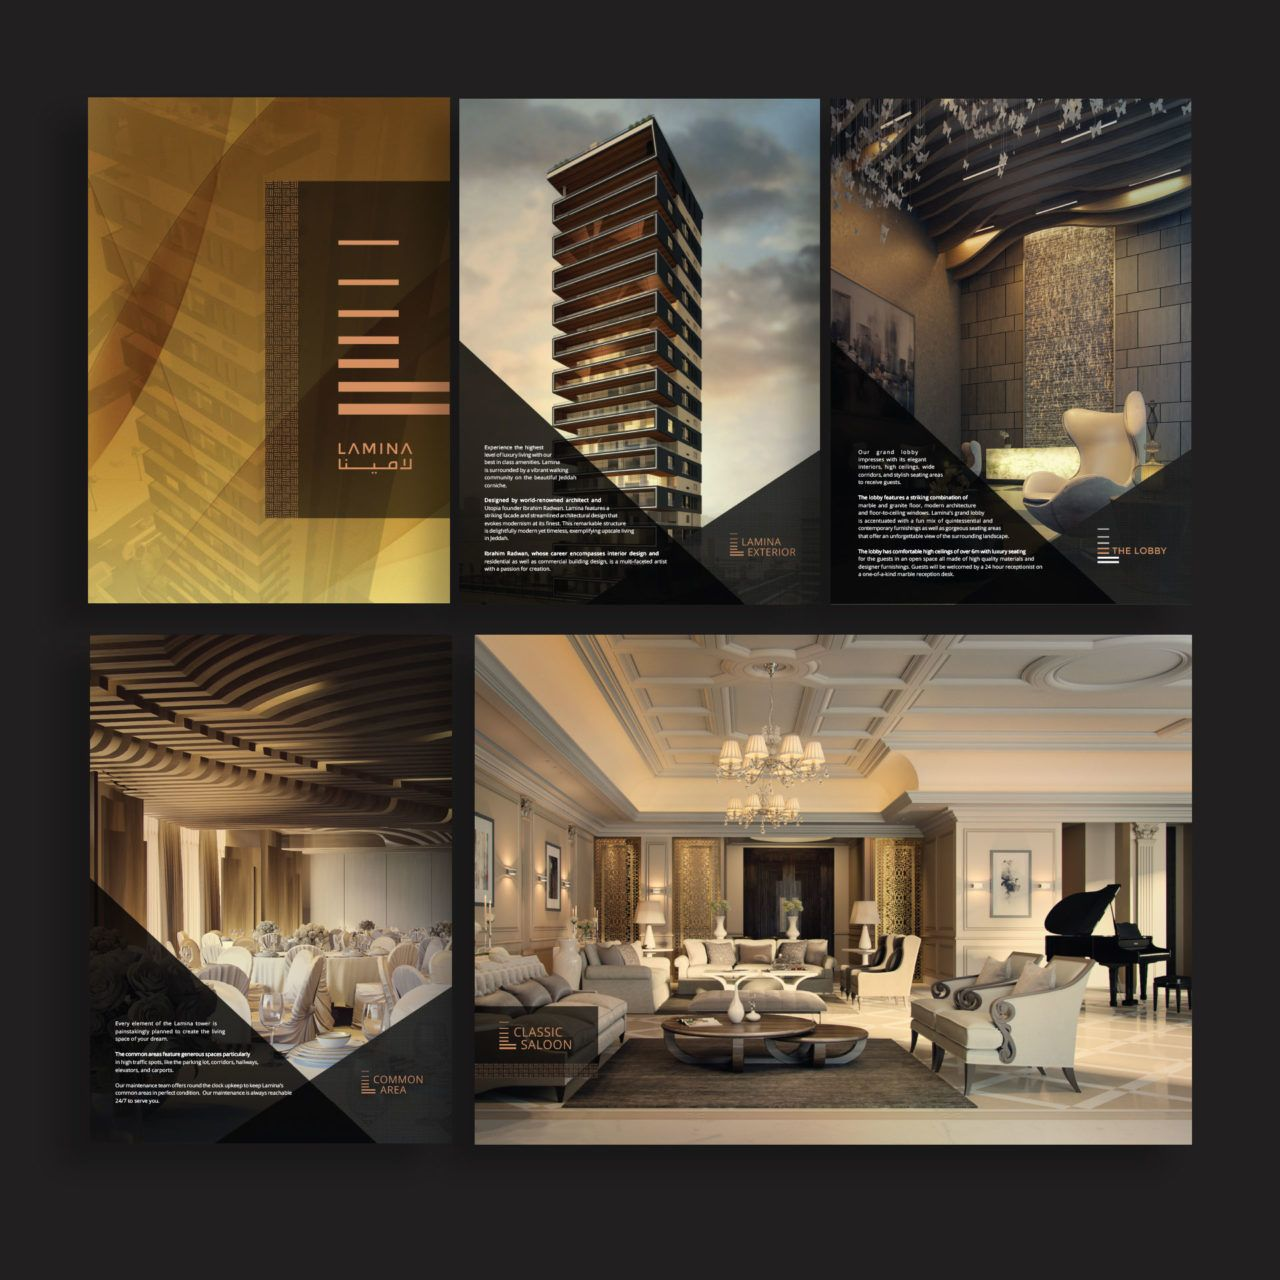 Jeddah Luxury Apartment Branding & Website